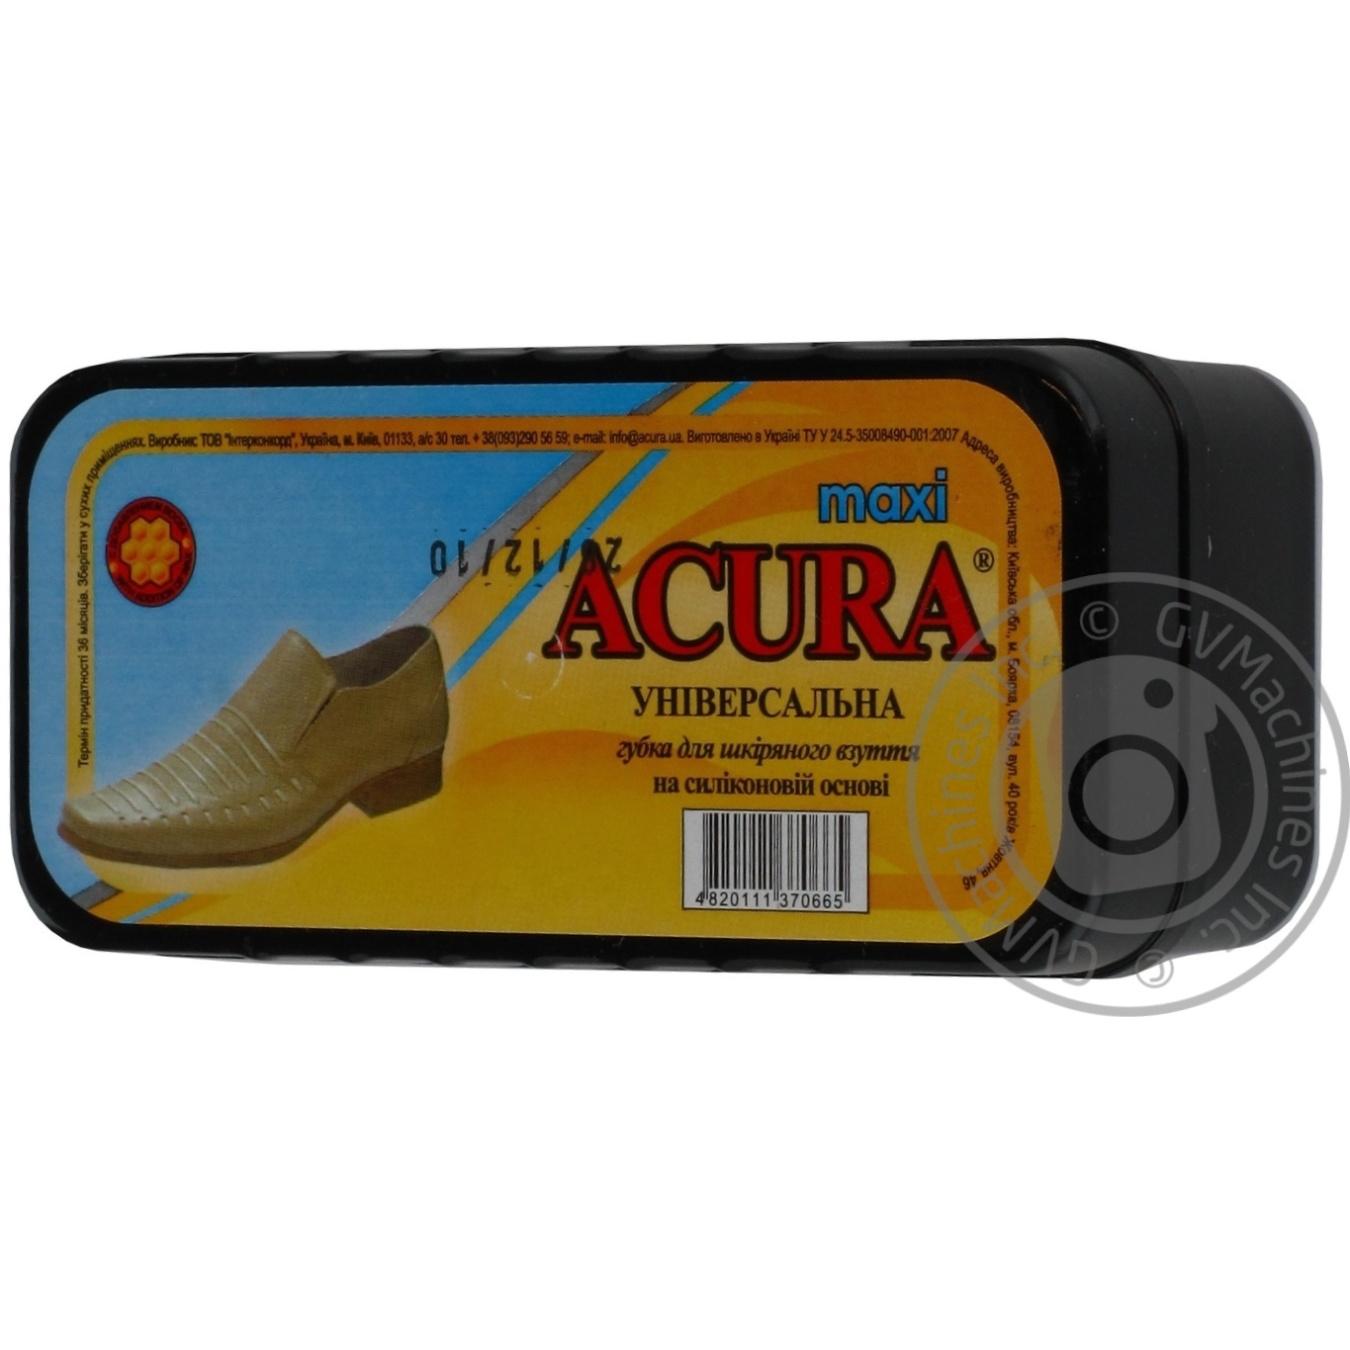 Sponge Acura for shoes Ukraine → Household → Household chemicals on